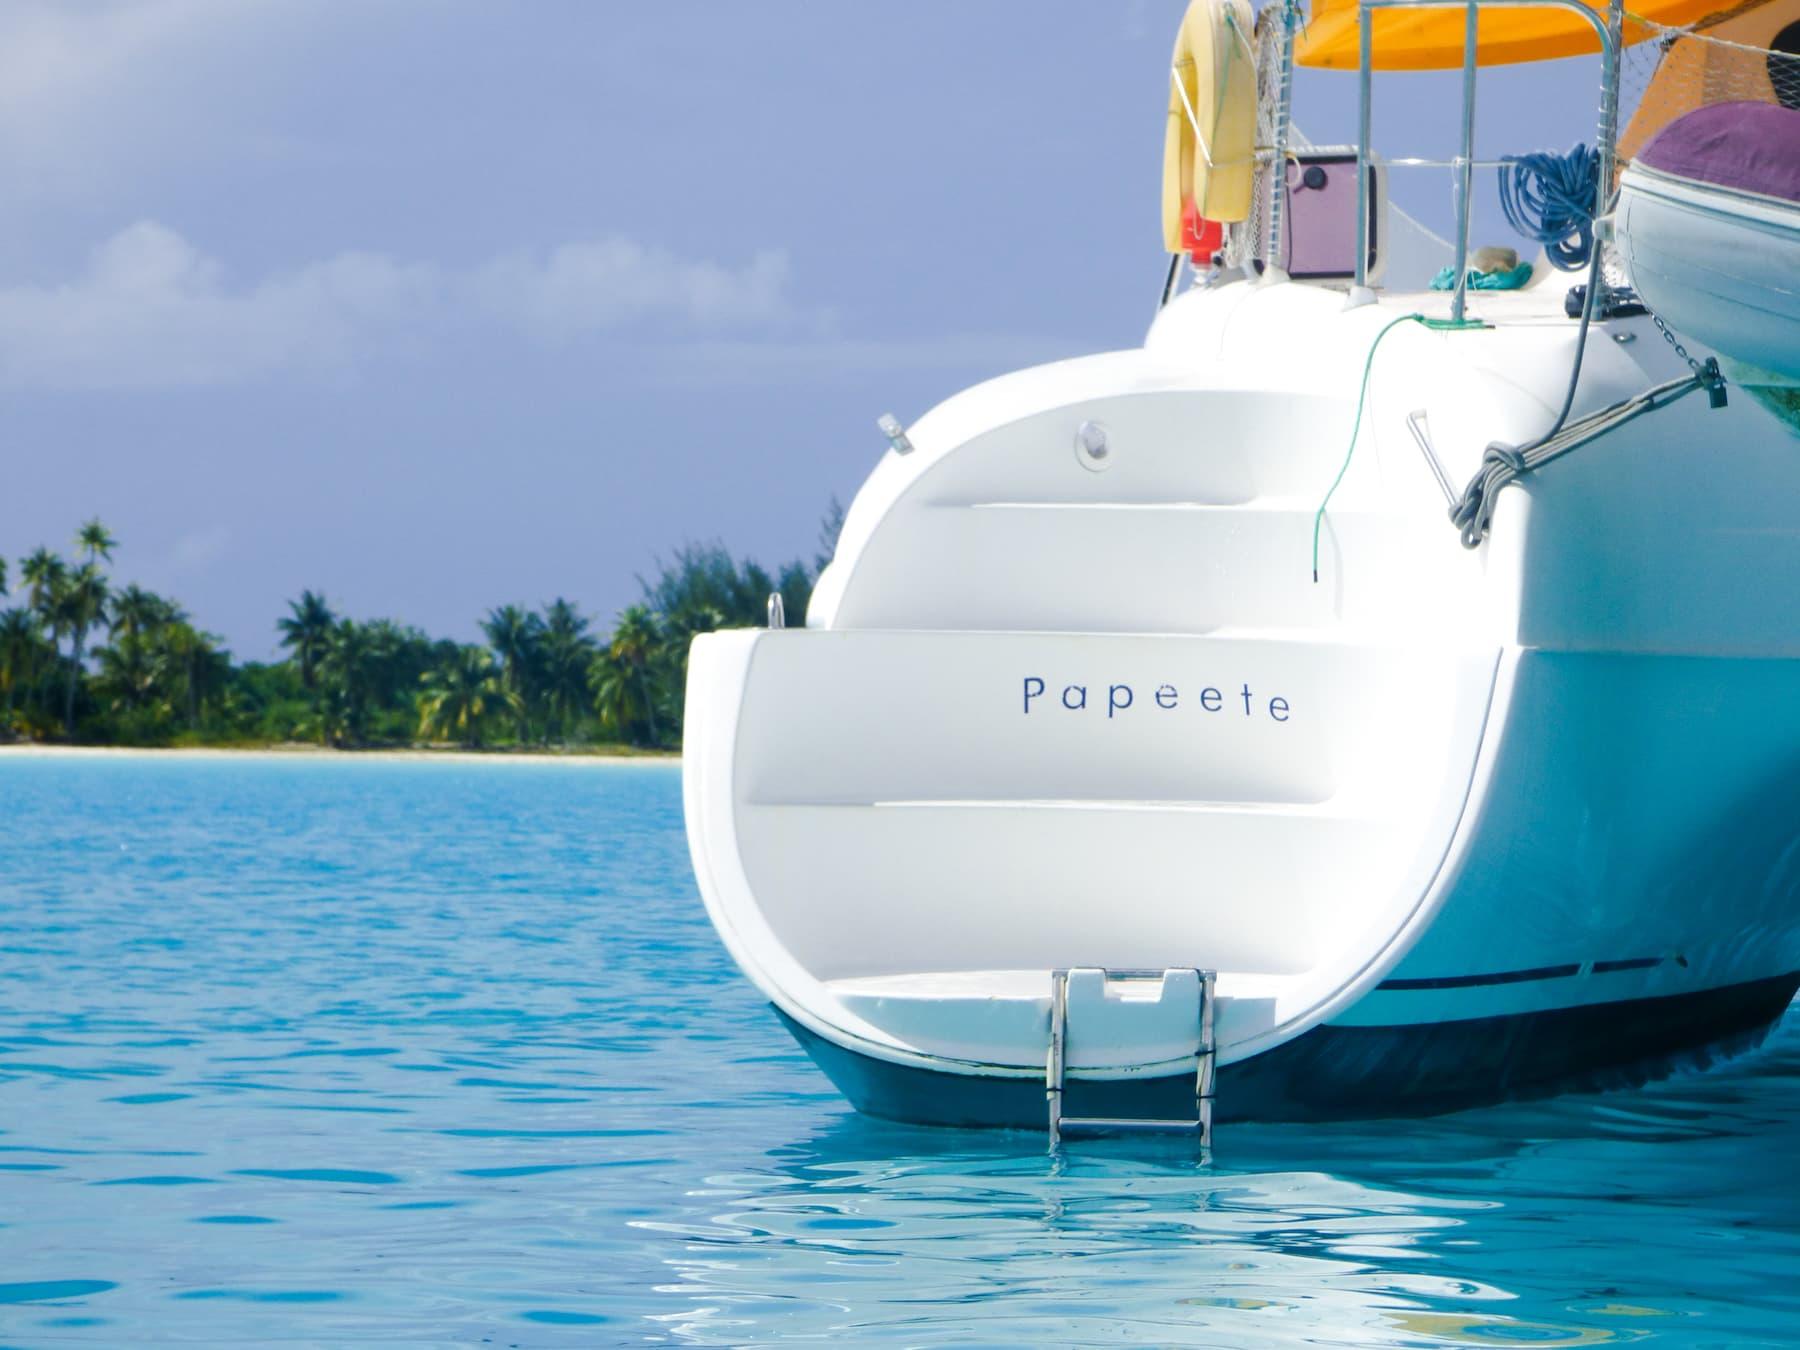 https://tahititourisme.com.au/wp-content/uploads/2017/08/bateau-tlc-modif-12.jpg